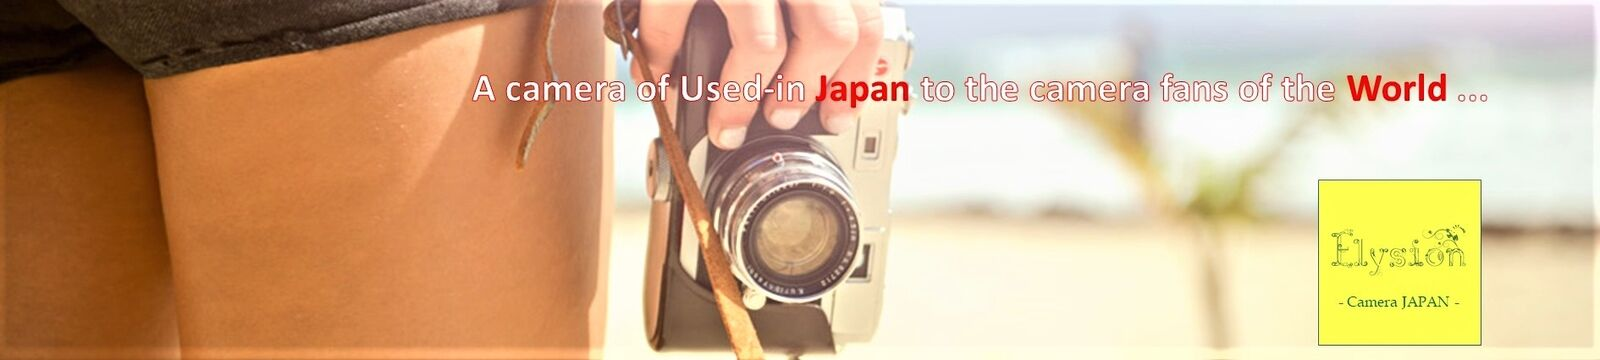 elysion-camera-japan